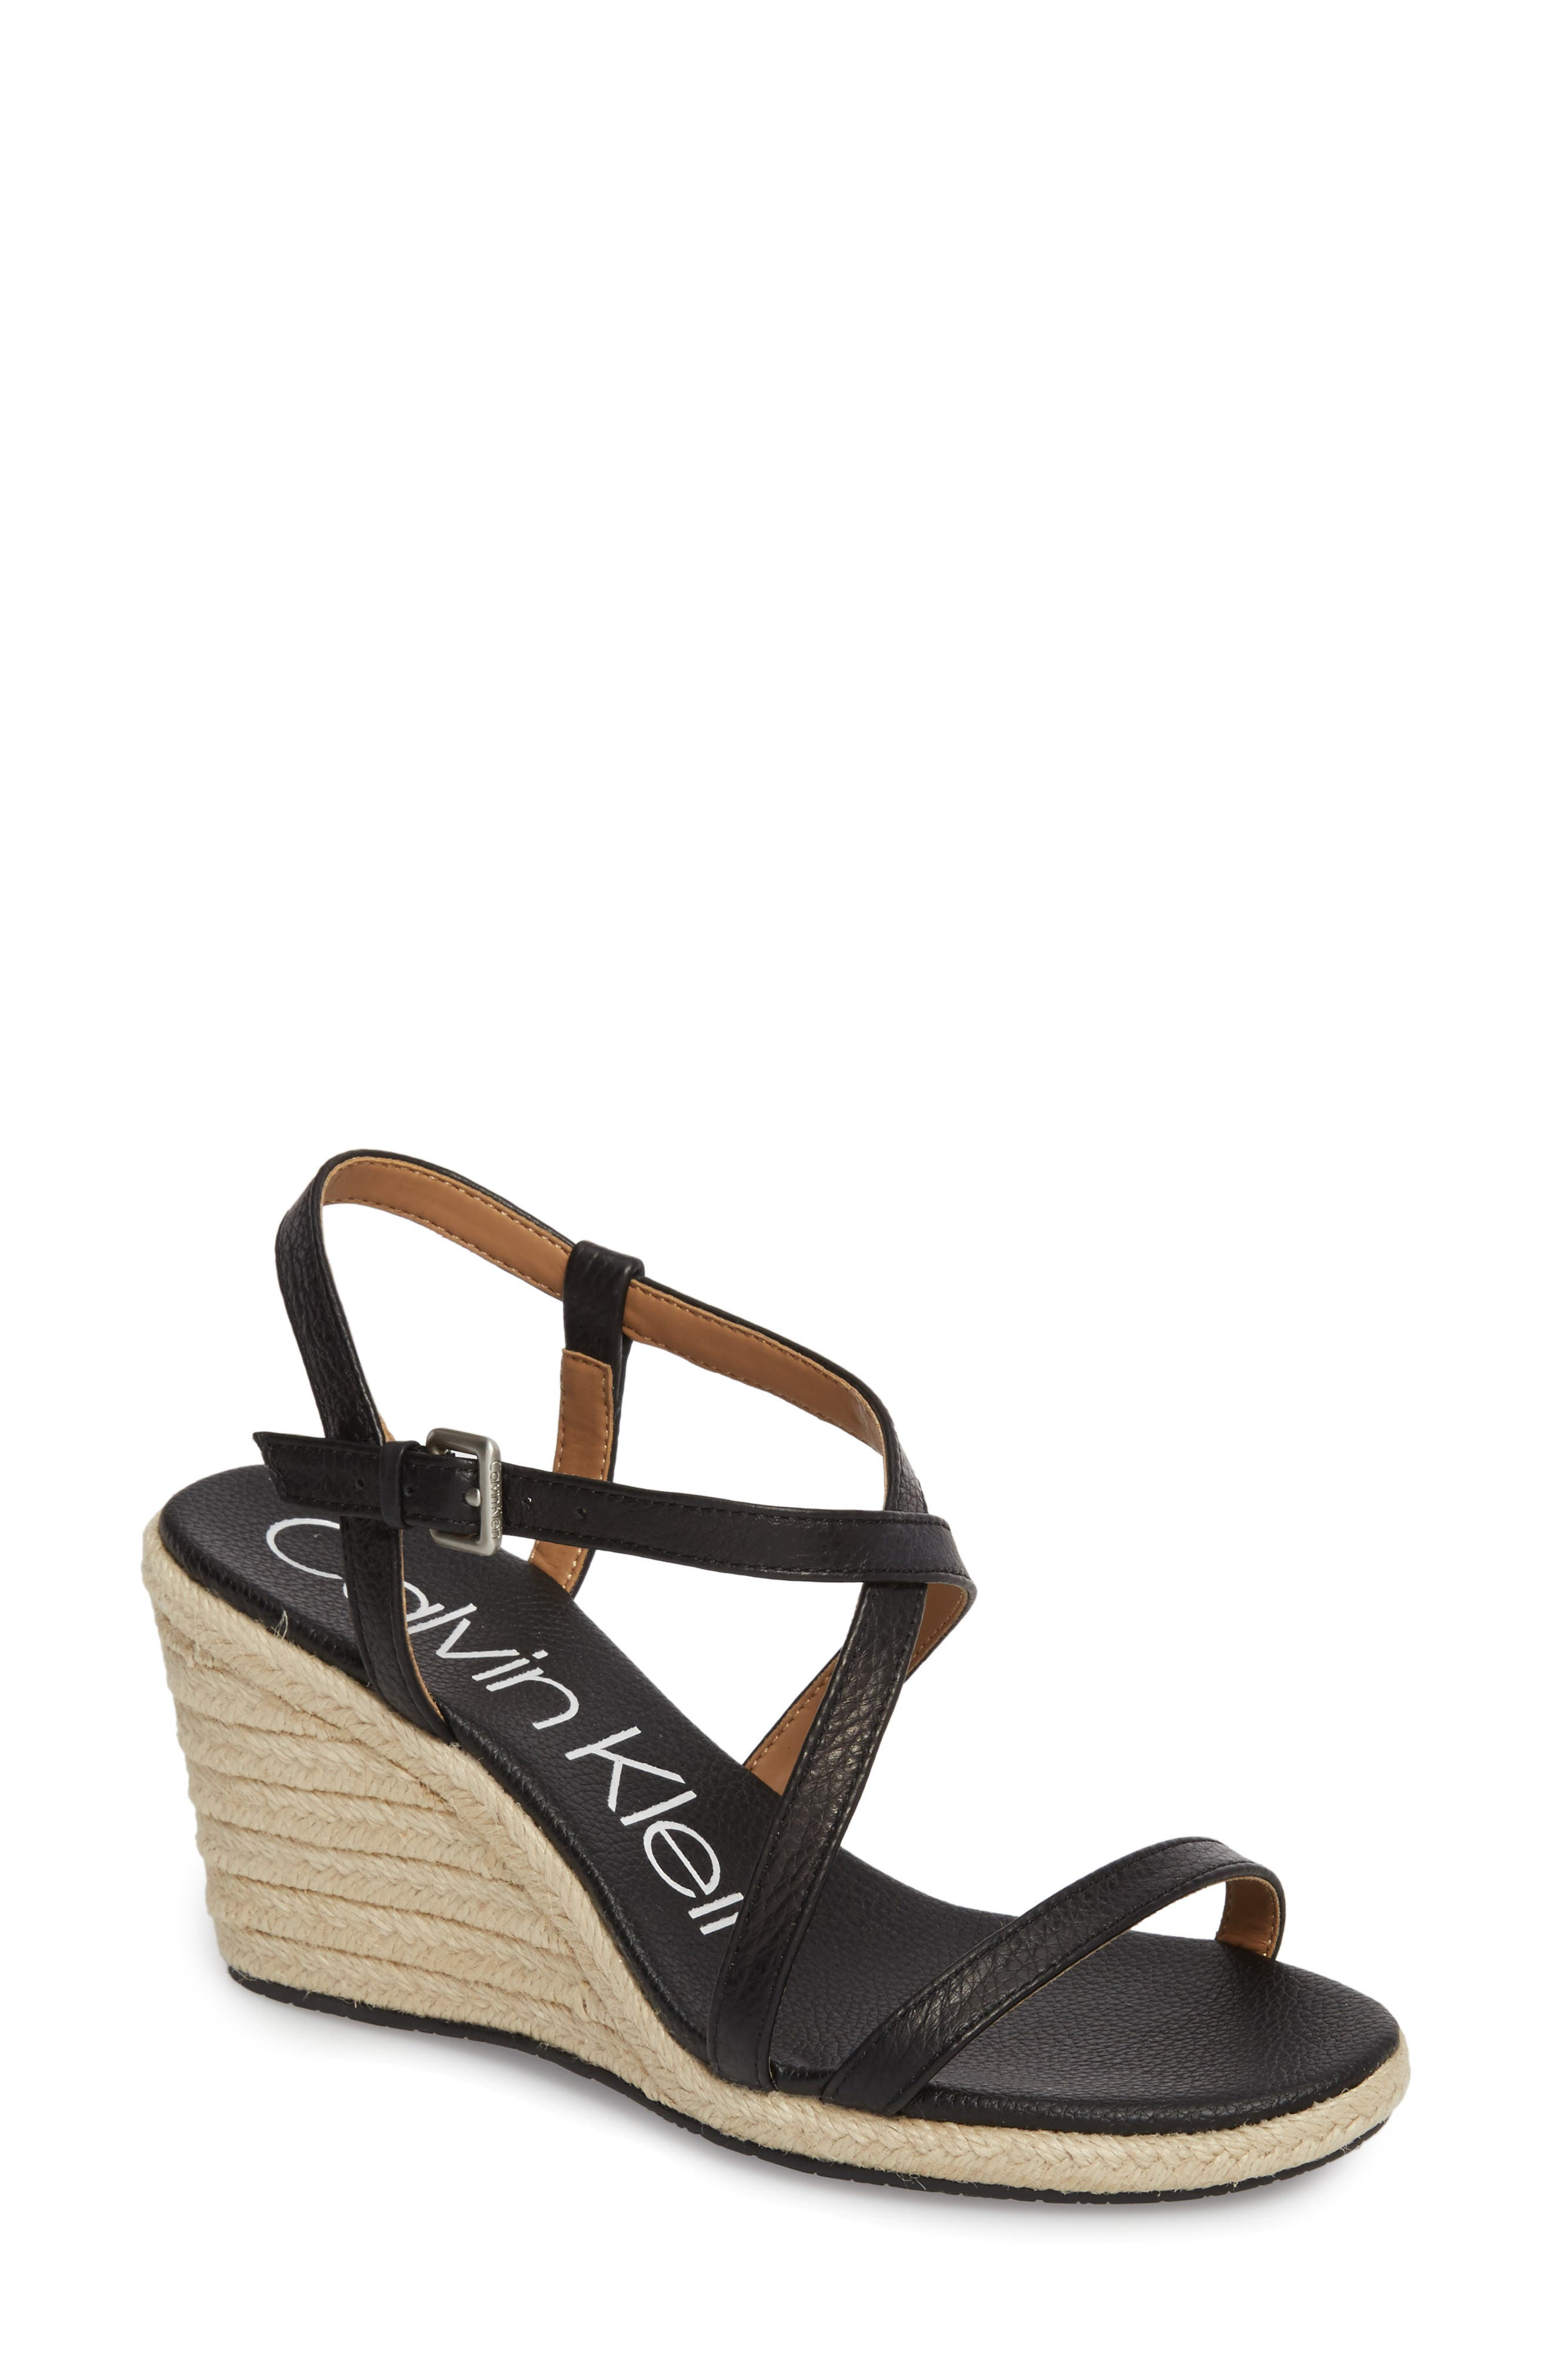 CALVIN KLEIN Bellemine Espadrille Wedge Sandal, Main, color, BLACK LEATHER